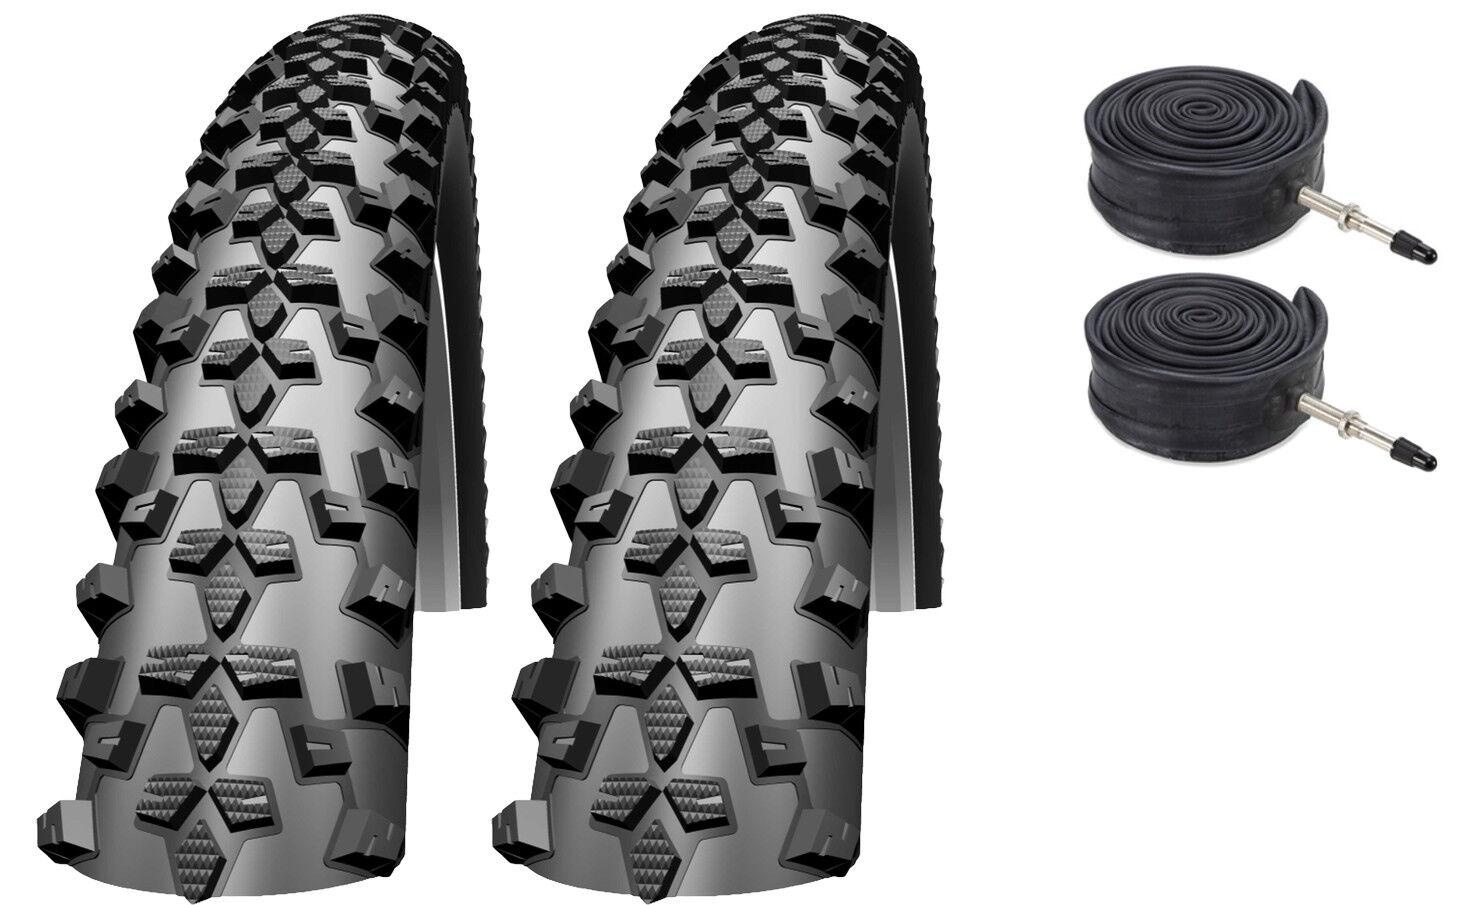 2x  XLC Mounatain X Mountain Bike   ATB Tyres With Inner Tubes 29 x 2.10   29er  credit guarantee